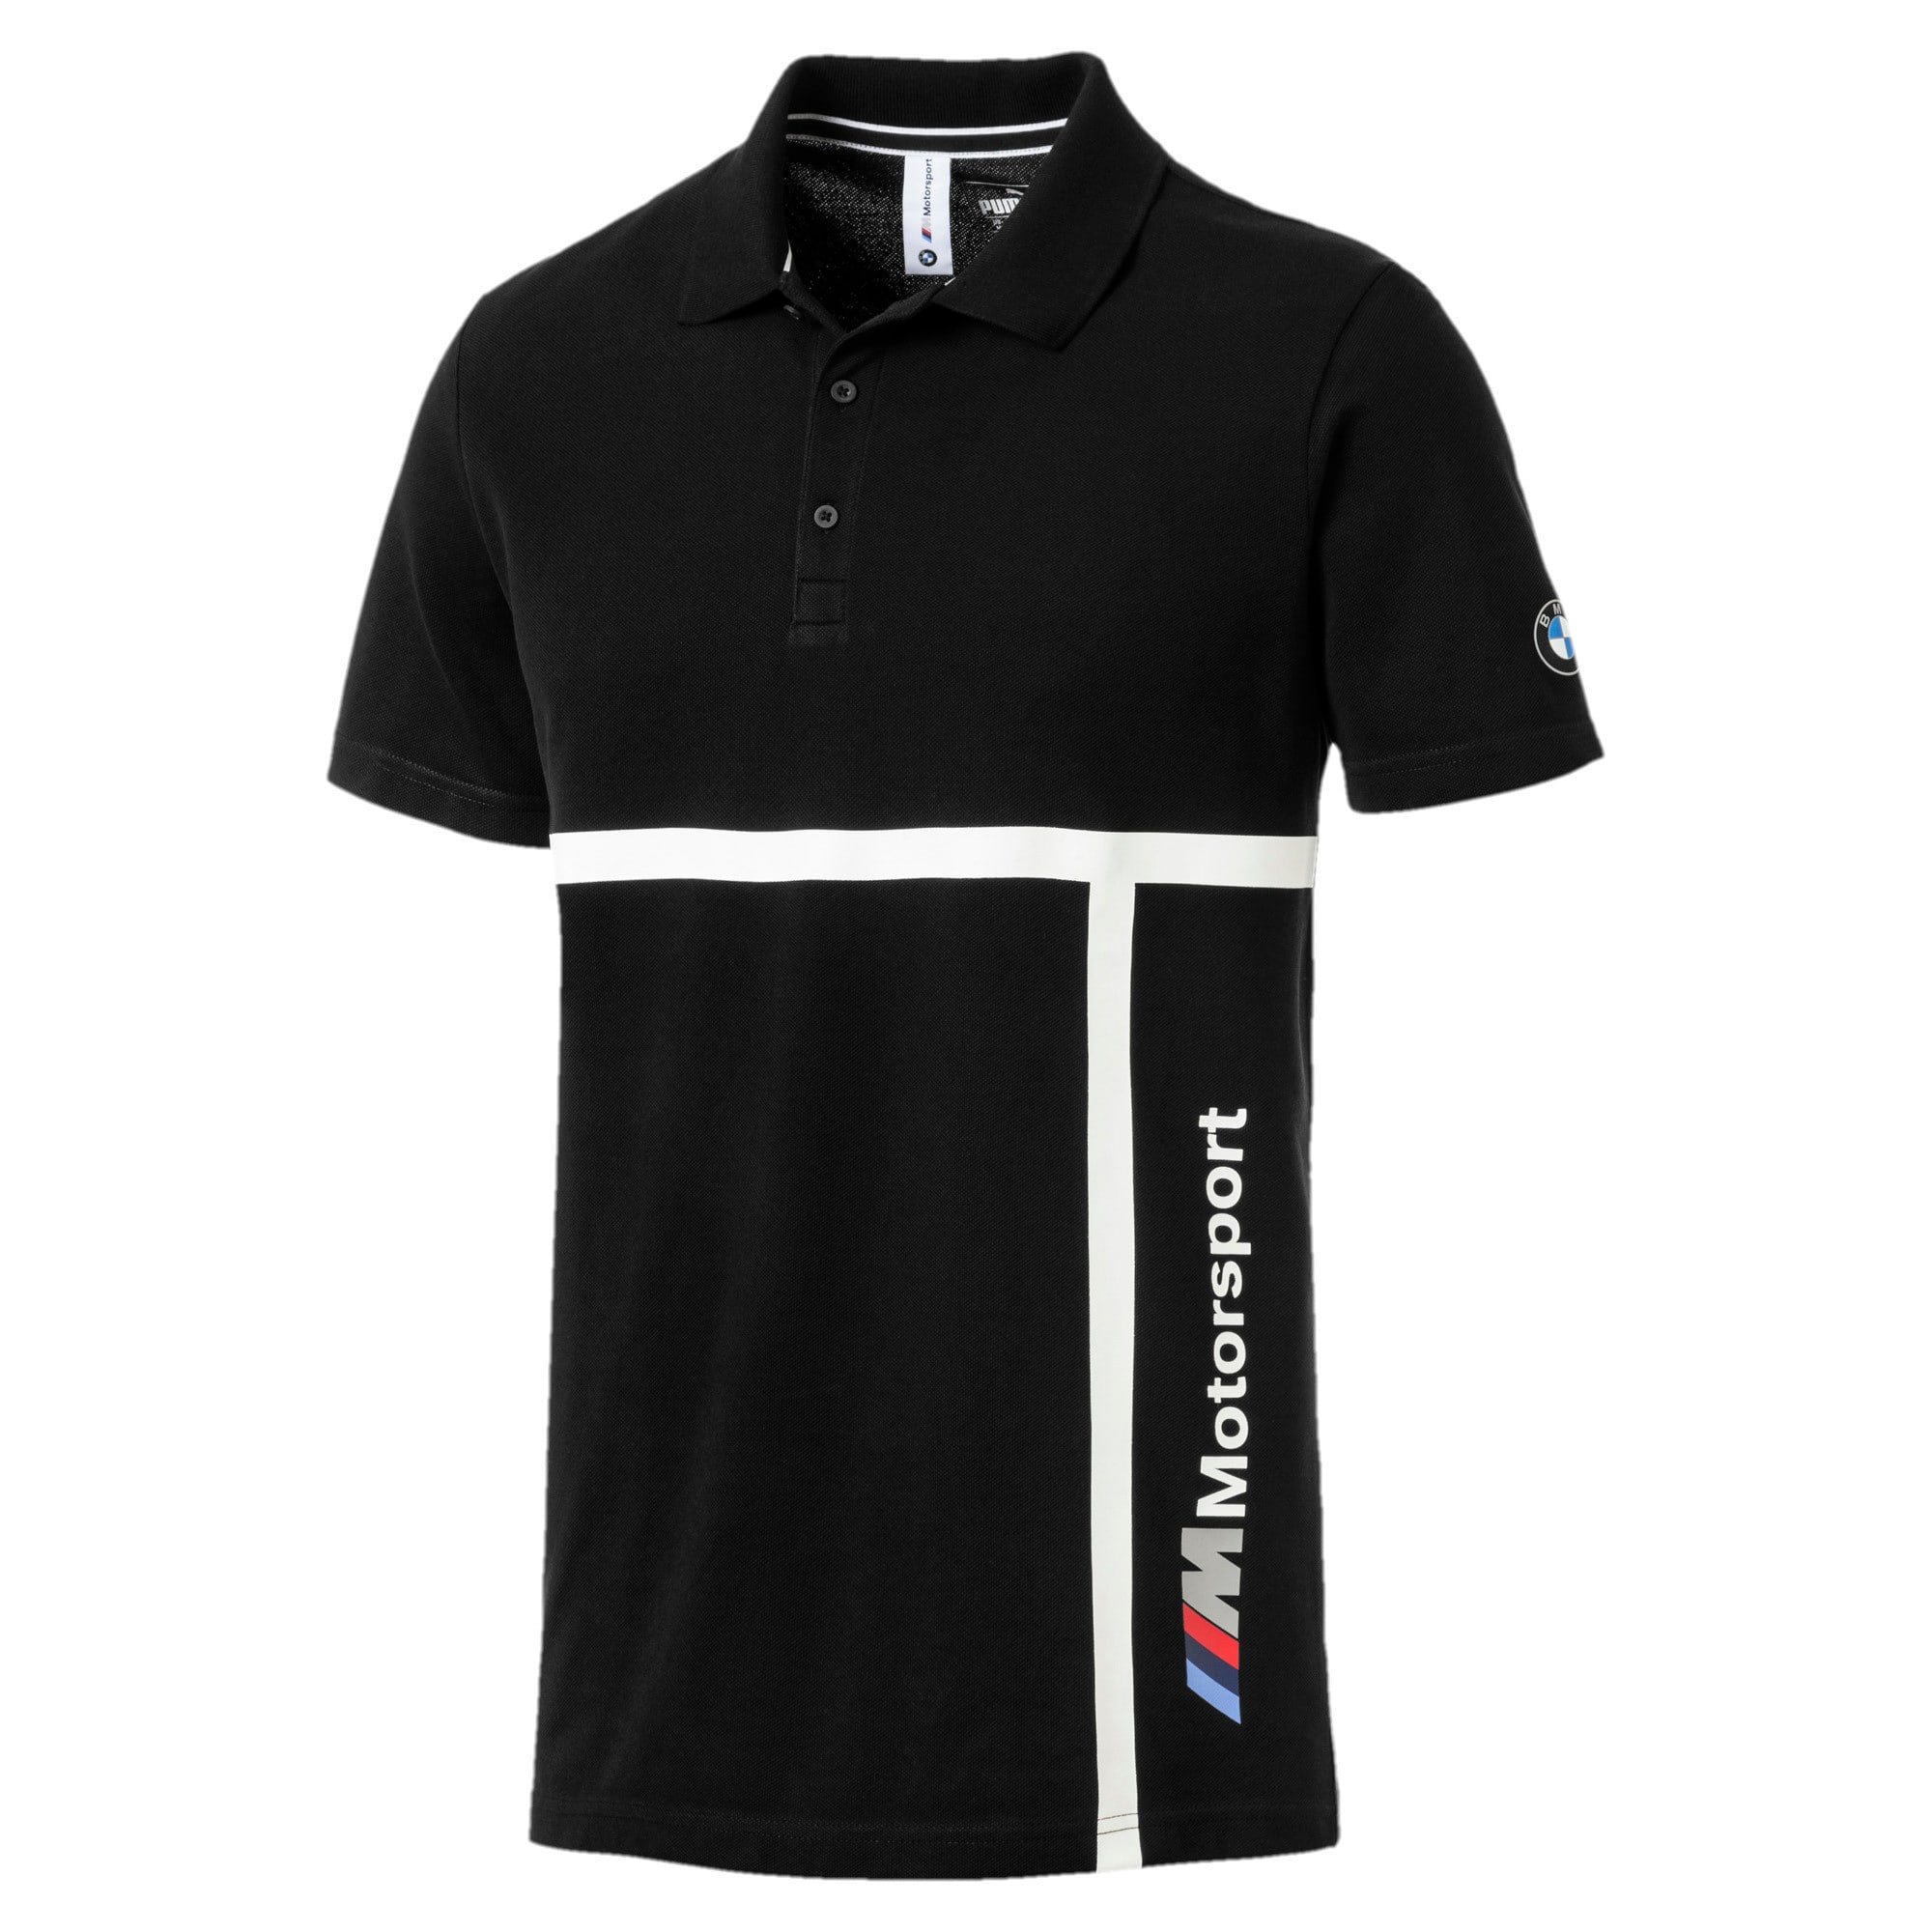 Thumbnail 4 of BMW M Motorsport Men's Polo, Puma Black, medium